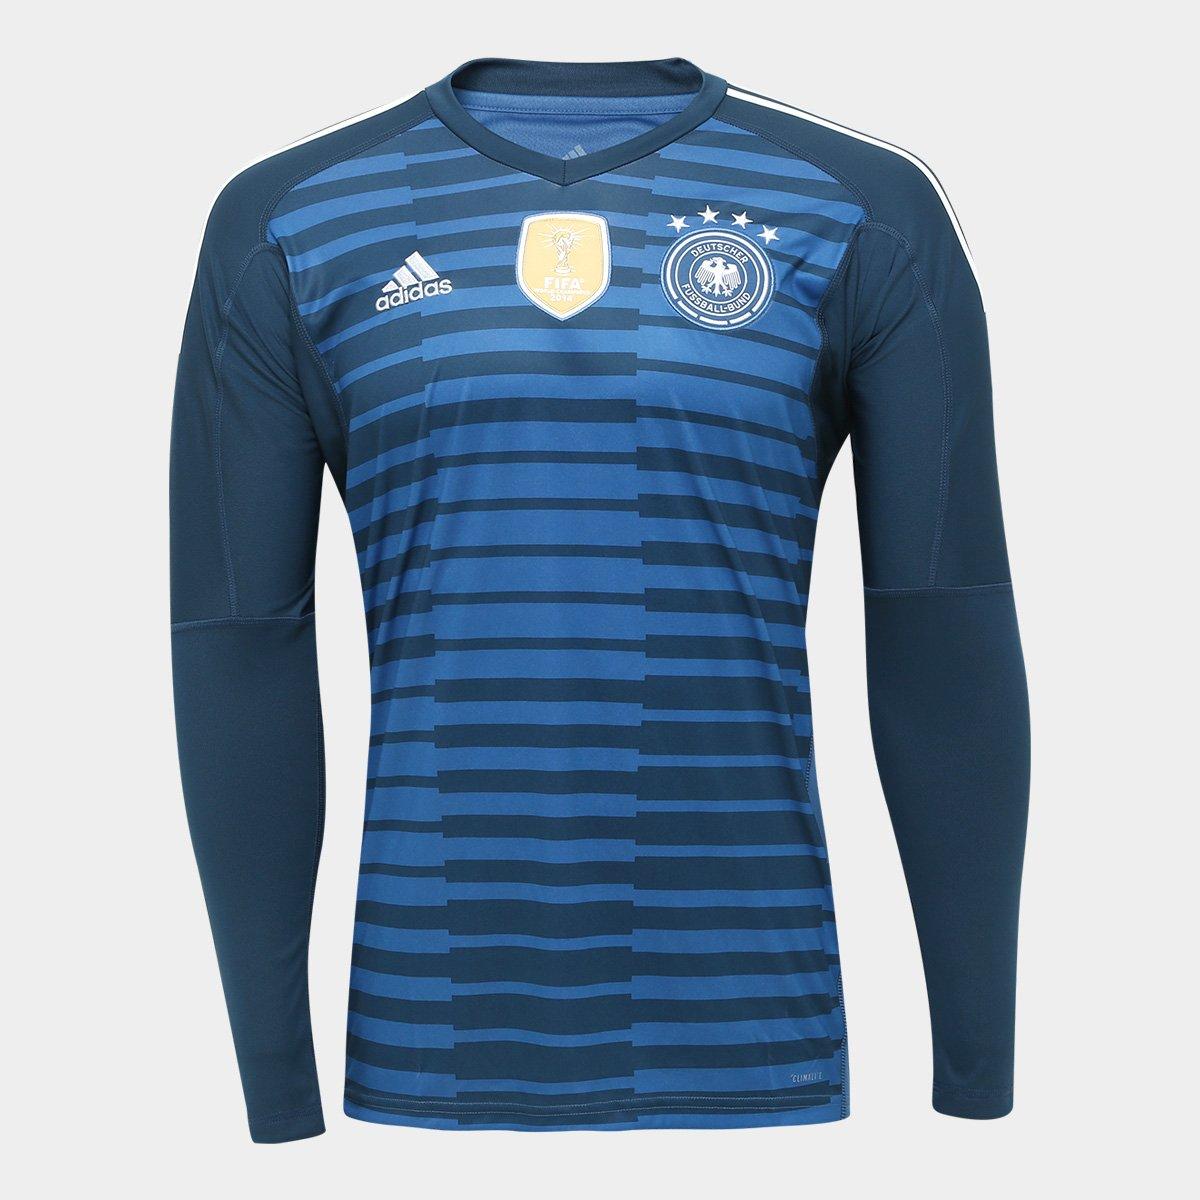 818370242d Camisa de Goleiro Alemanha 17 18 s n° Torcedor Adidas Masculina ...